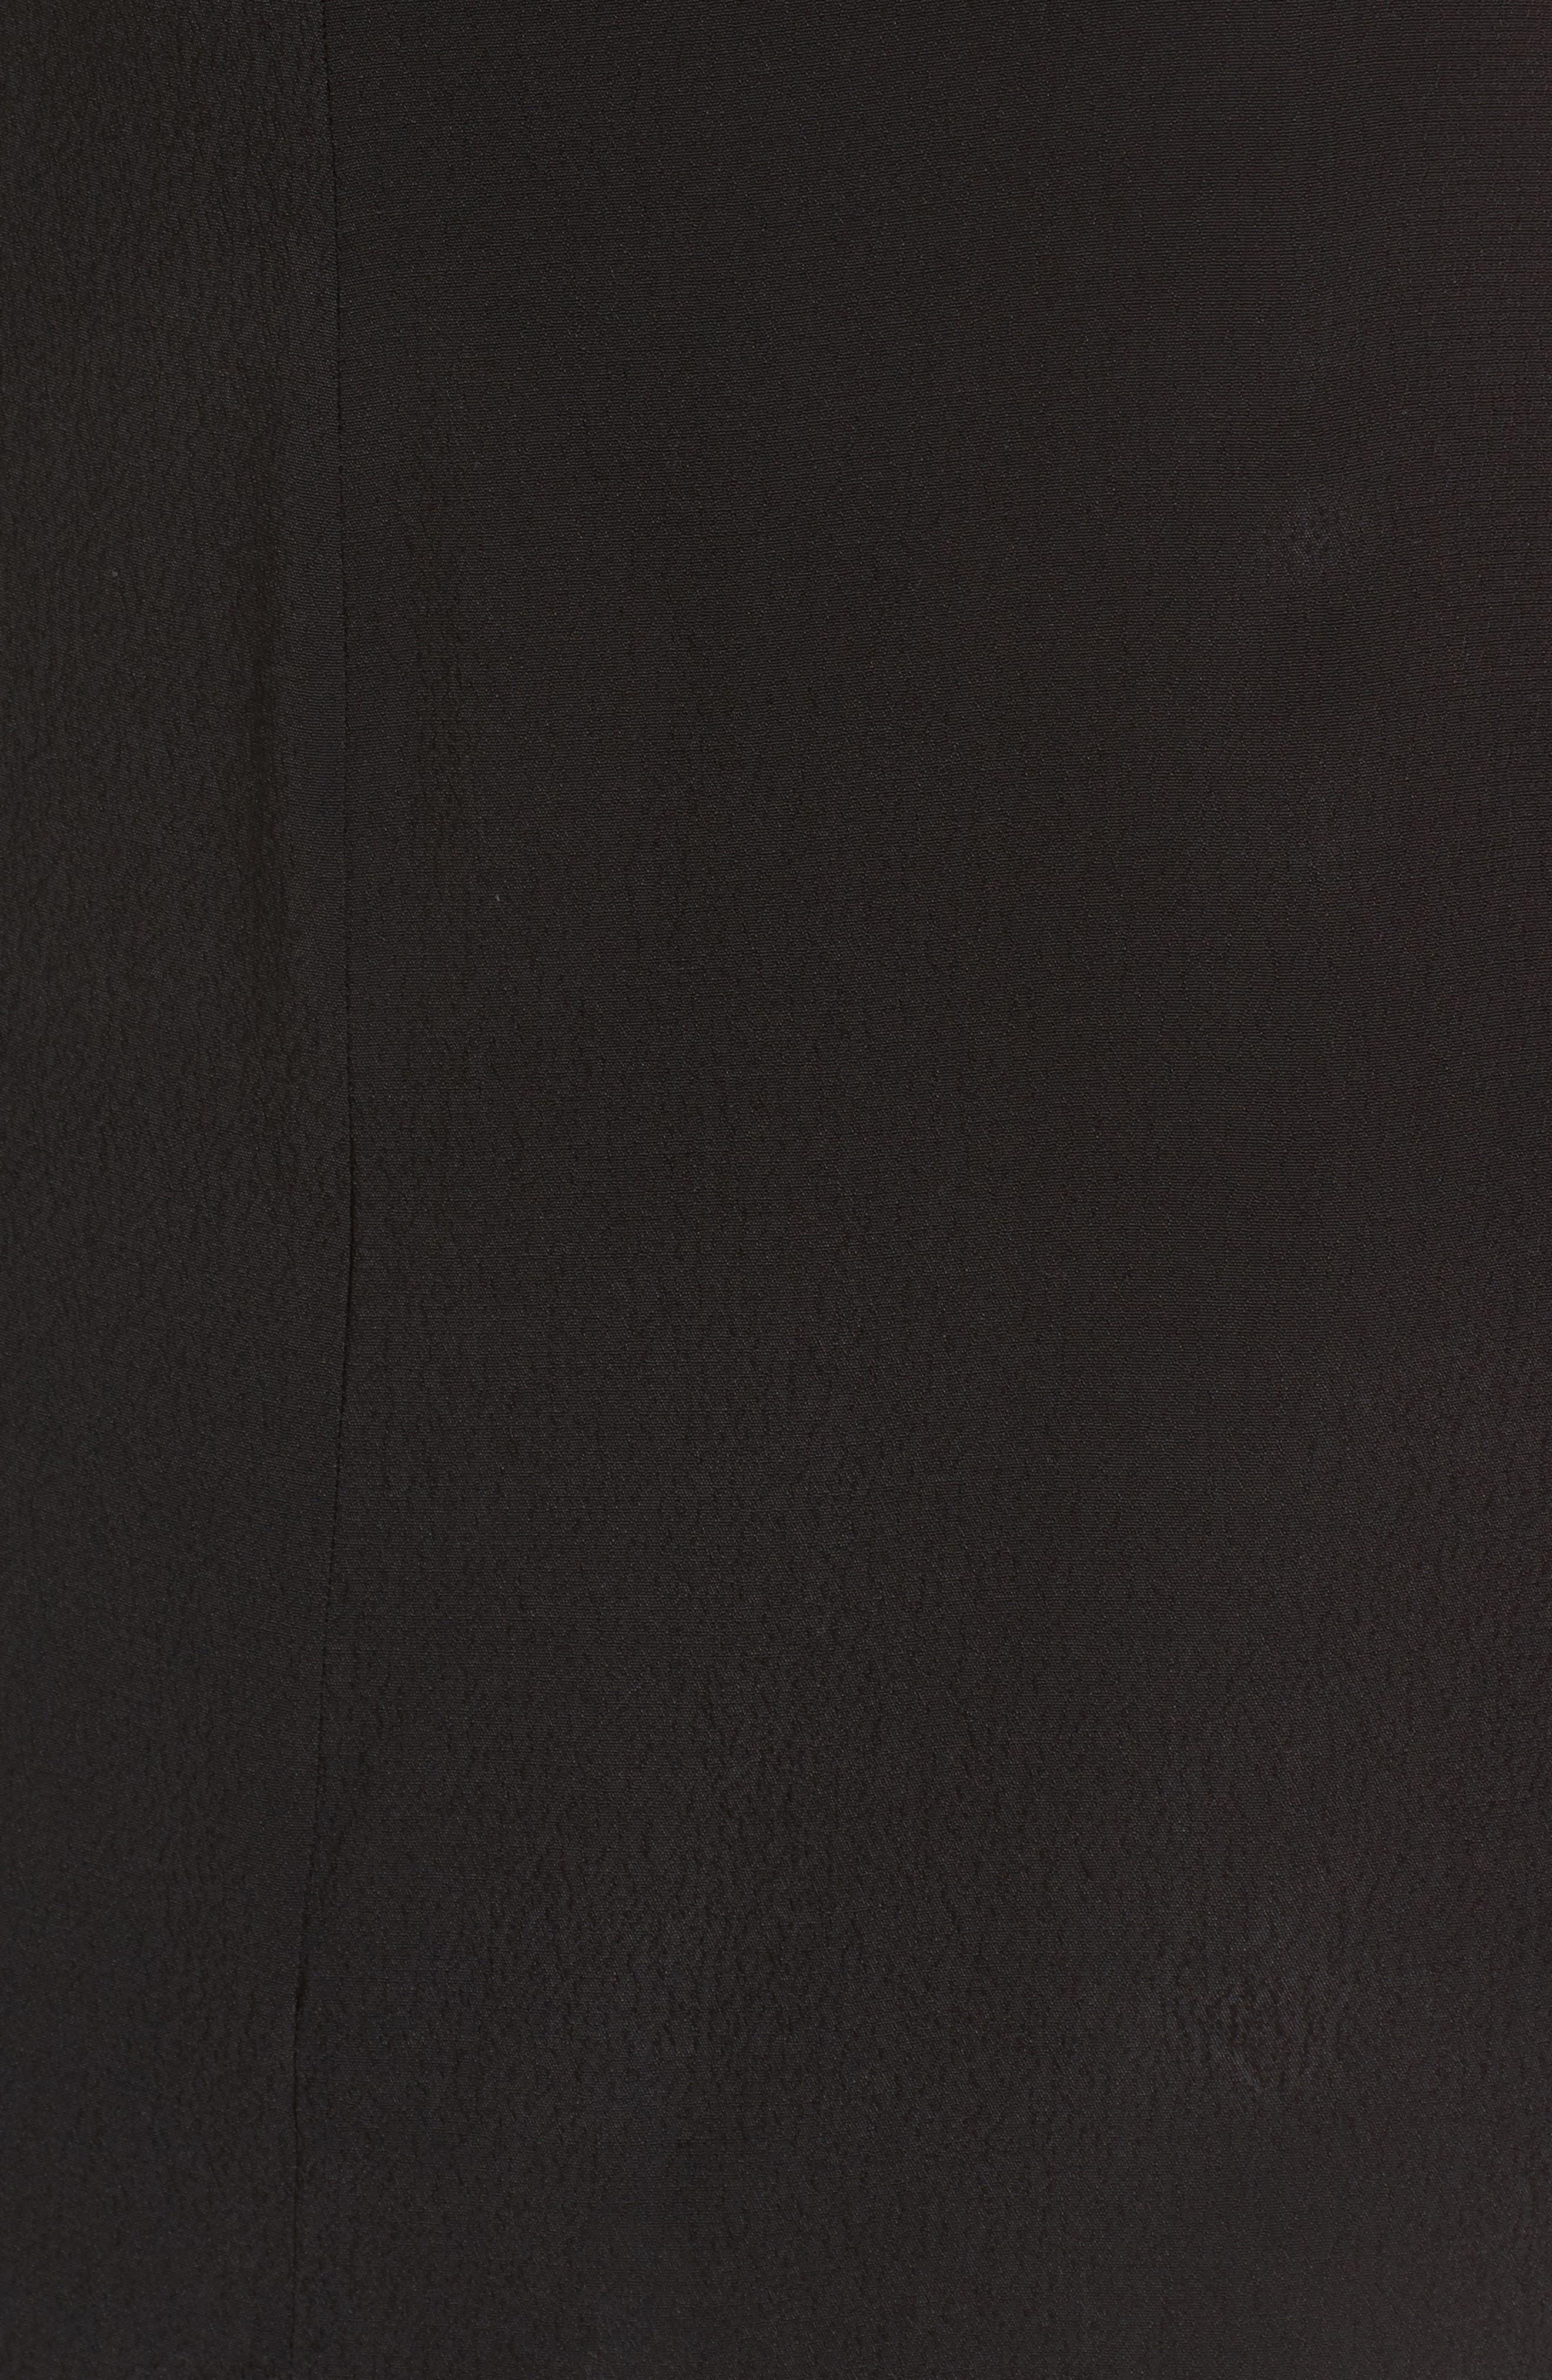 Backless Sheath Dress,                             Alternate thumbnail 5, color,                             Black